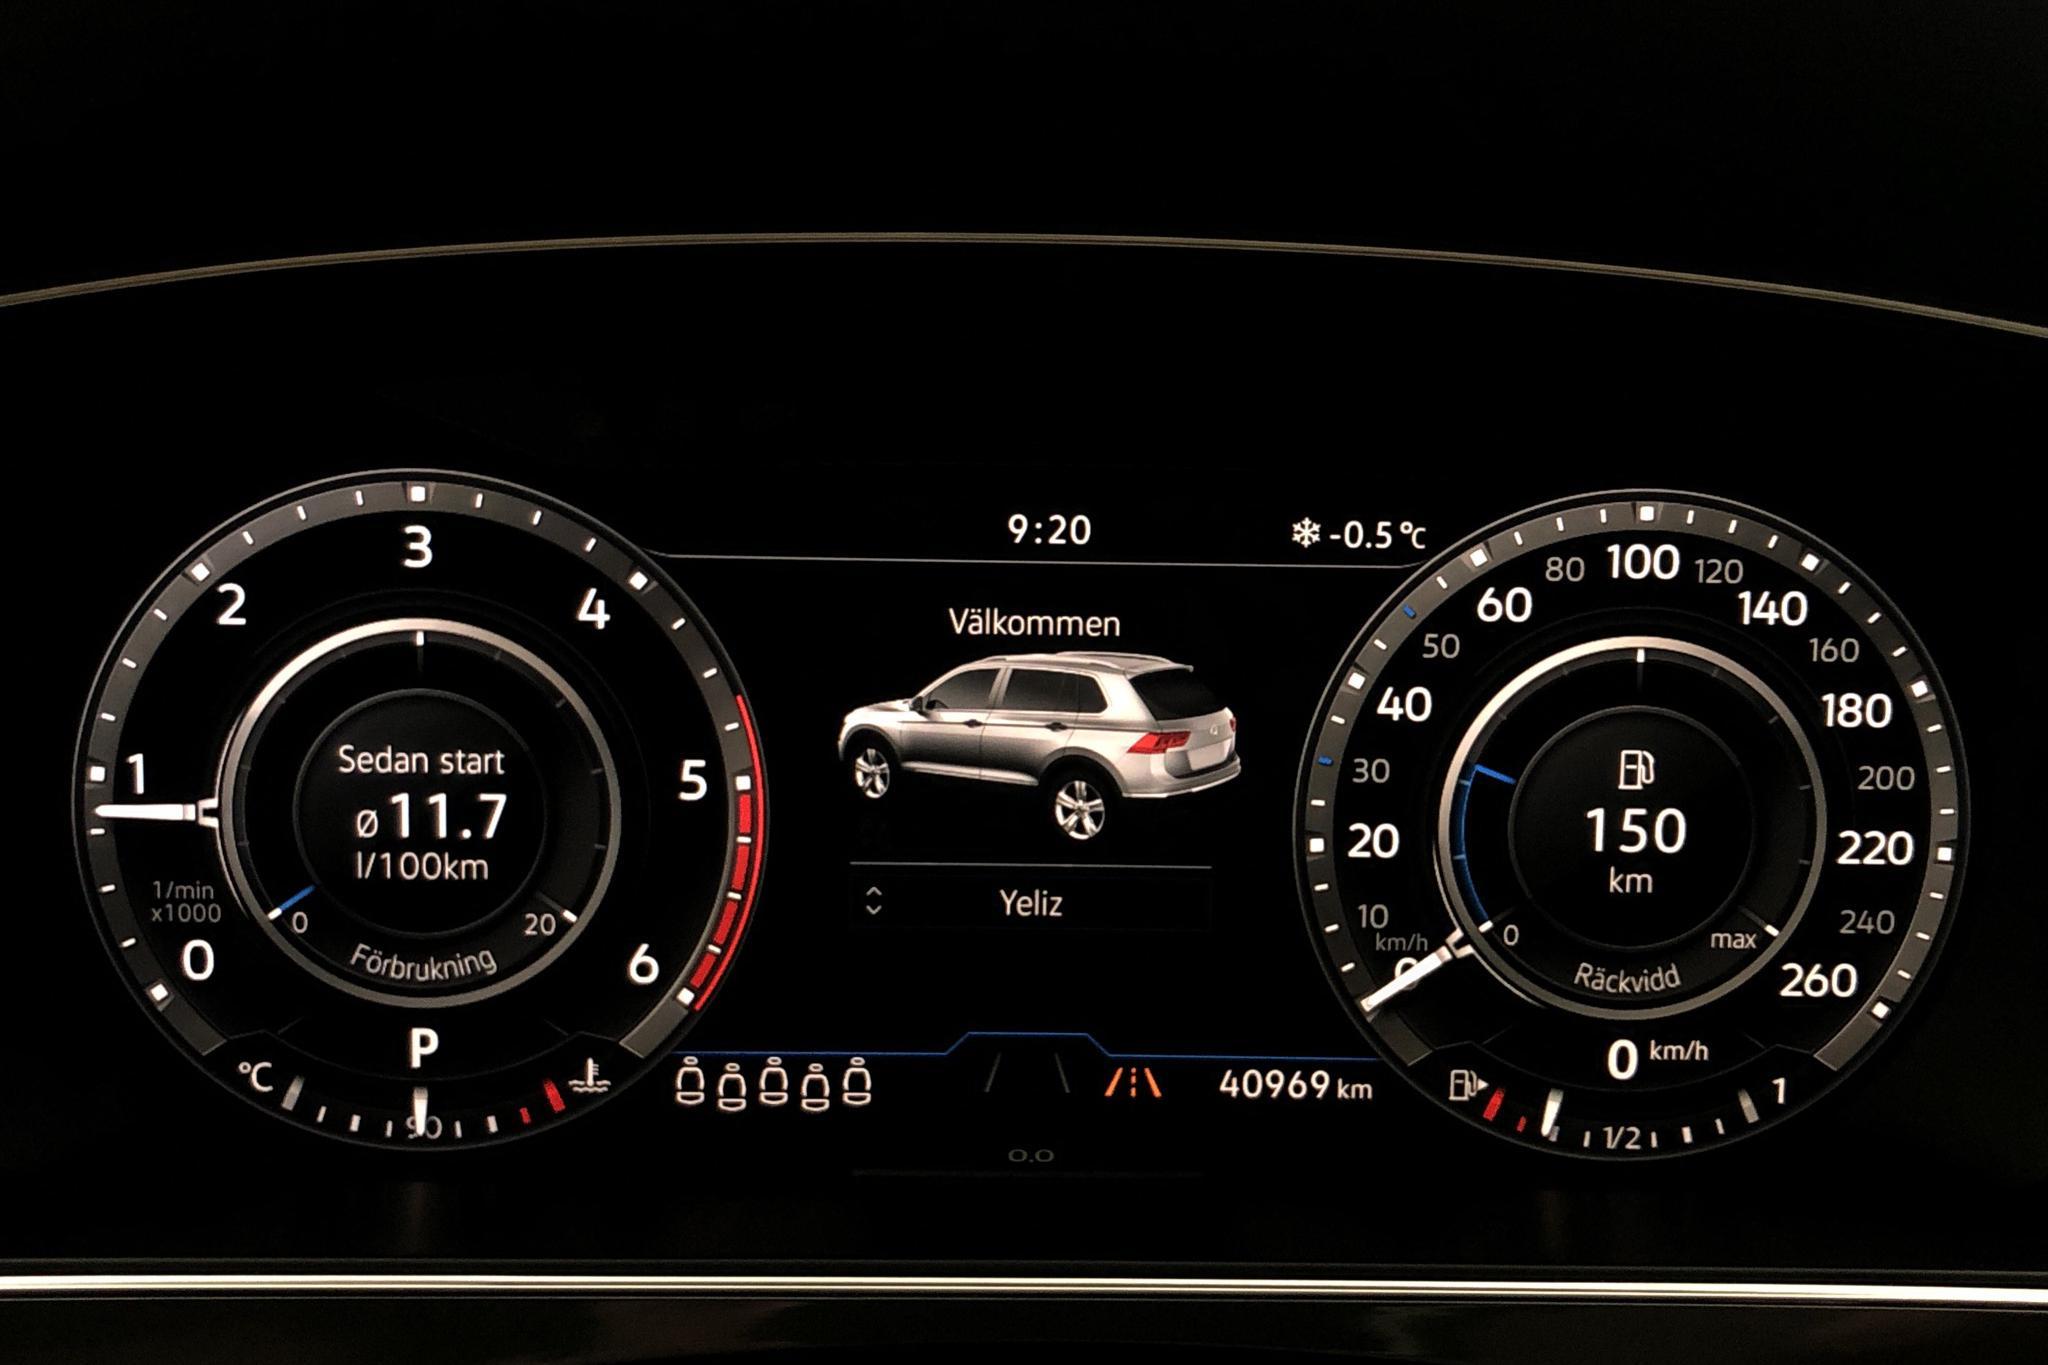 VW Tiguan Allspace 2.0 TDI 4MOTION (190hk) - 4 096 mil - Automat - vit - 2019